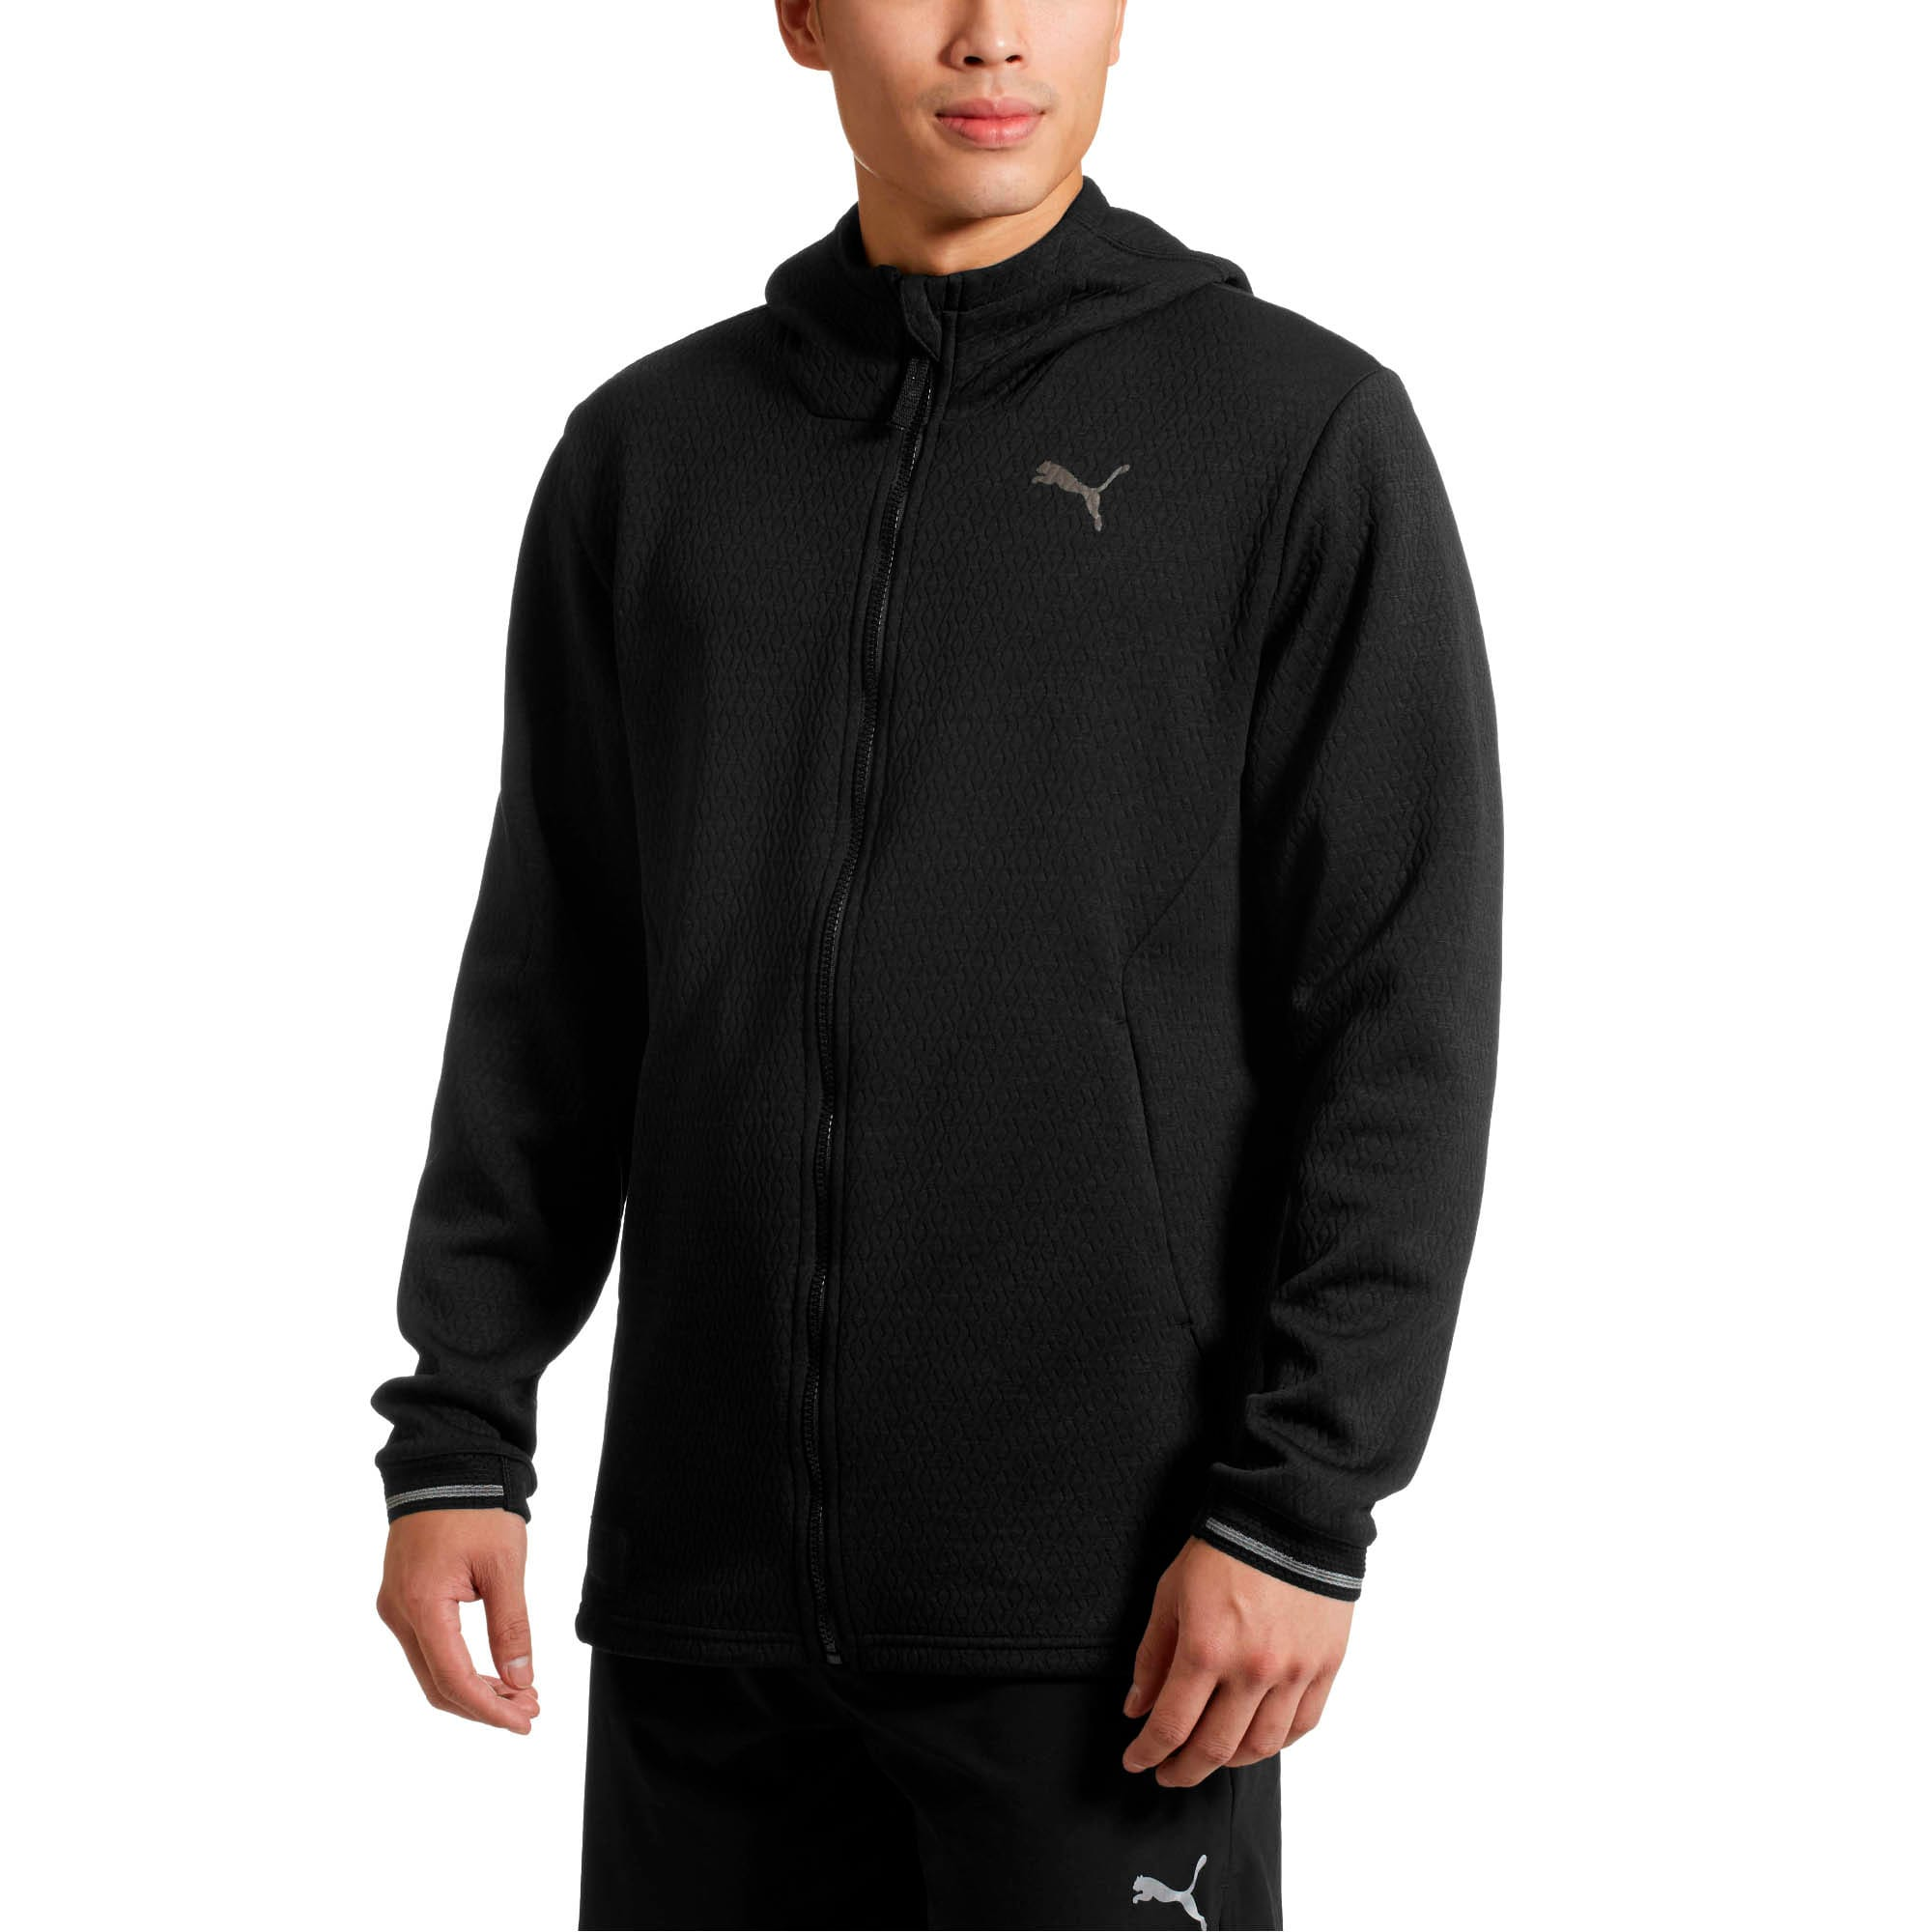 Thumbnail 2 of Energy Zip-Up Hooded Men's Running Jacket, Puma Black Heather, medium